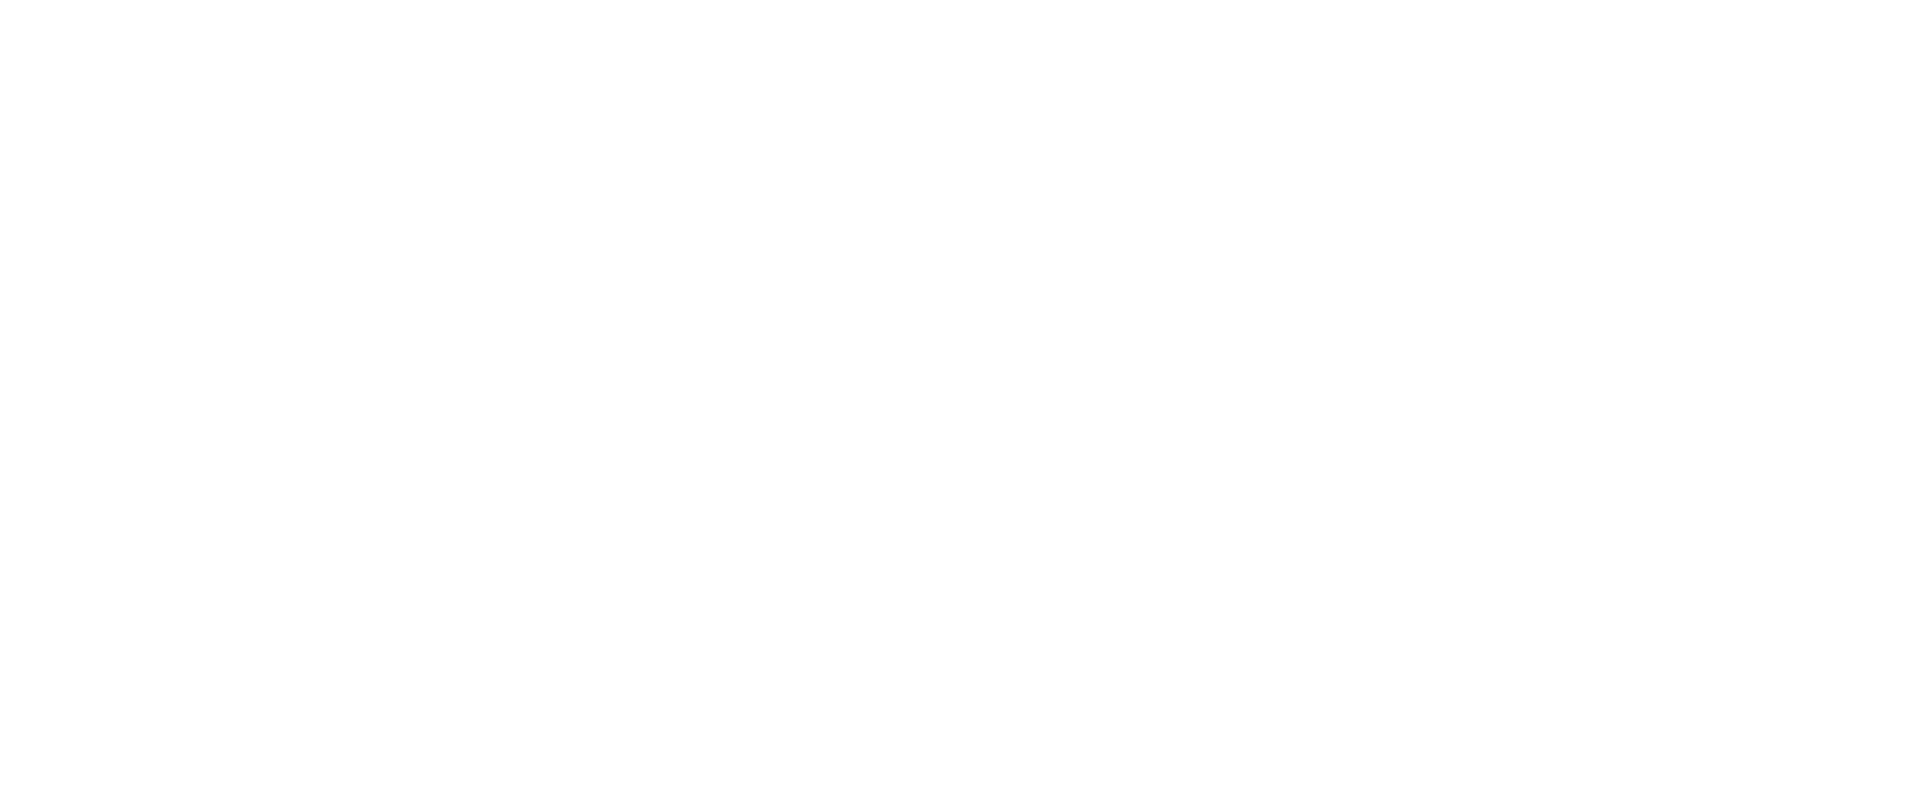 squarespace-expert-badge-transparent-outline.png